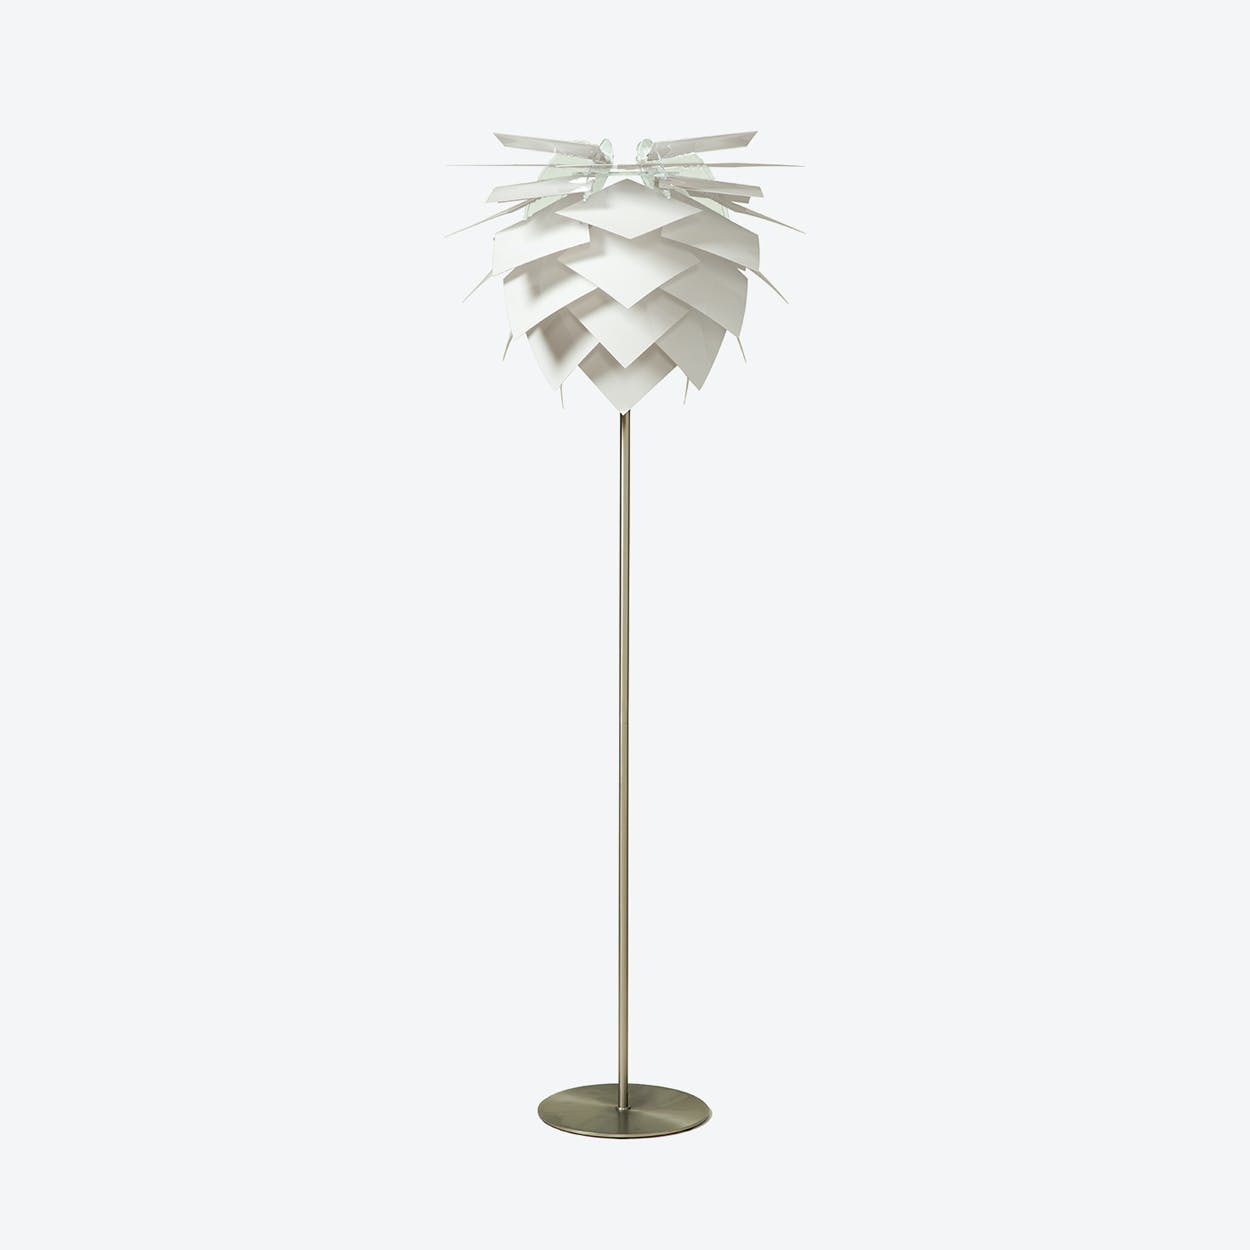 Medium PineApple White Floor Lamp in Matte Satin Finish